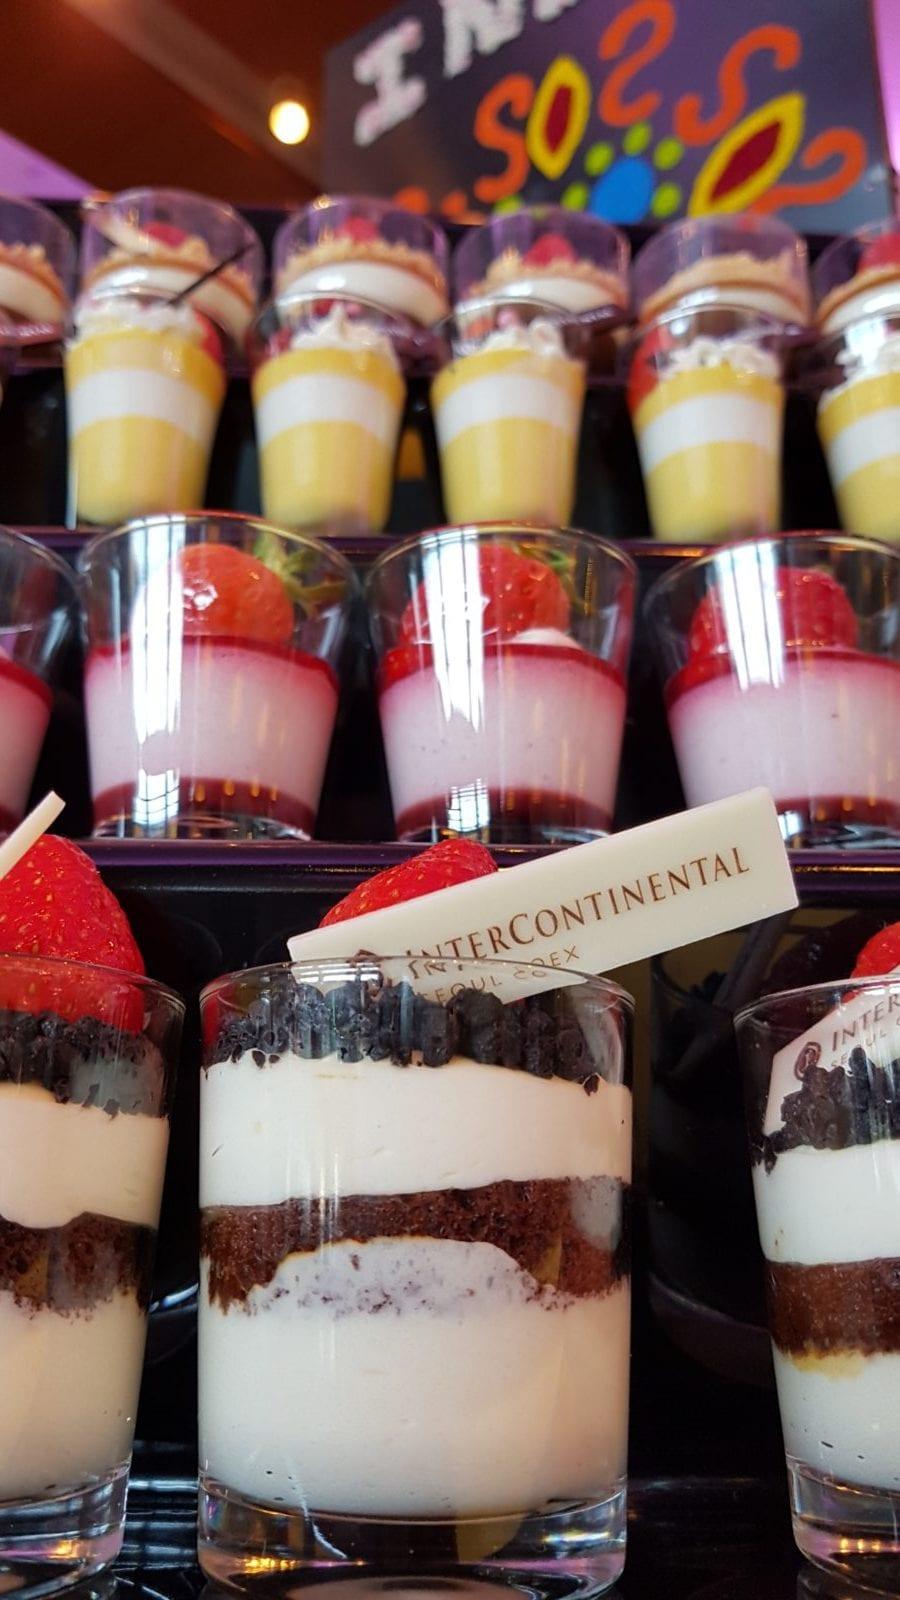 Strawberry Intercontinental COEX Seoul